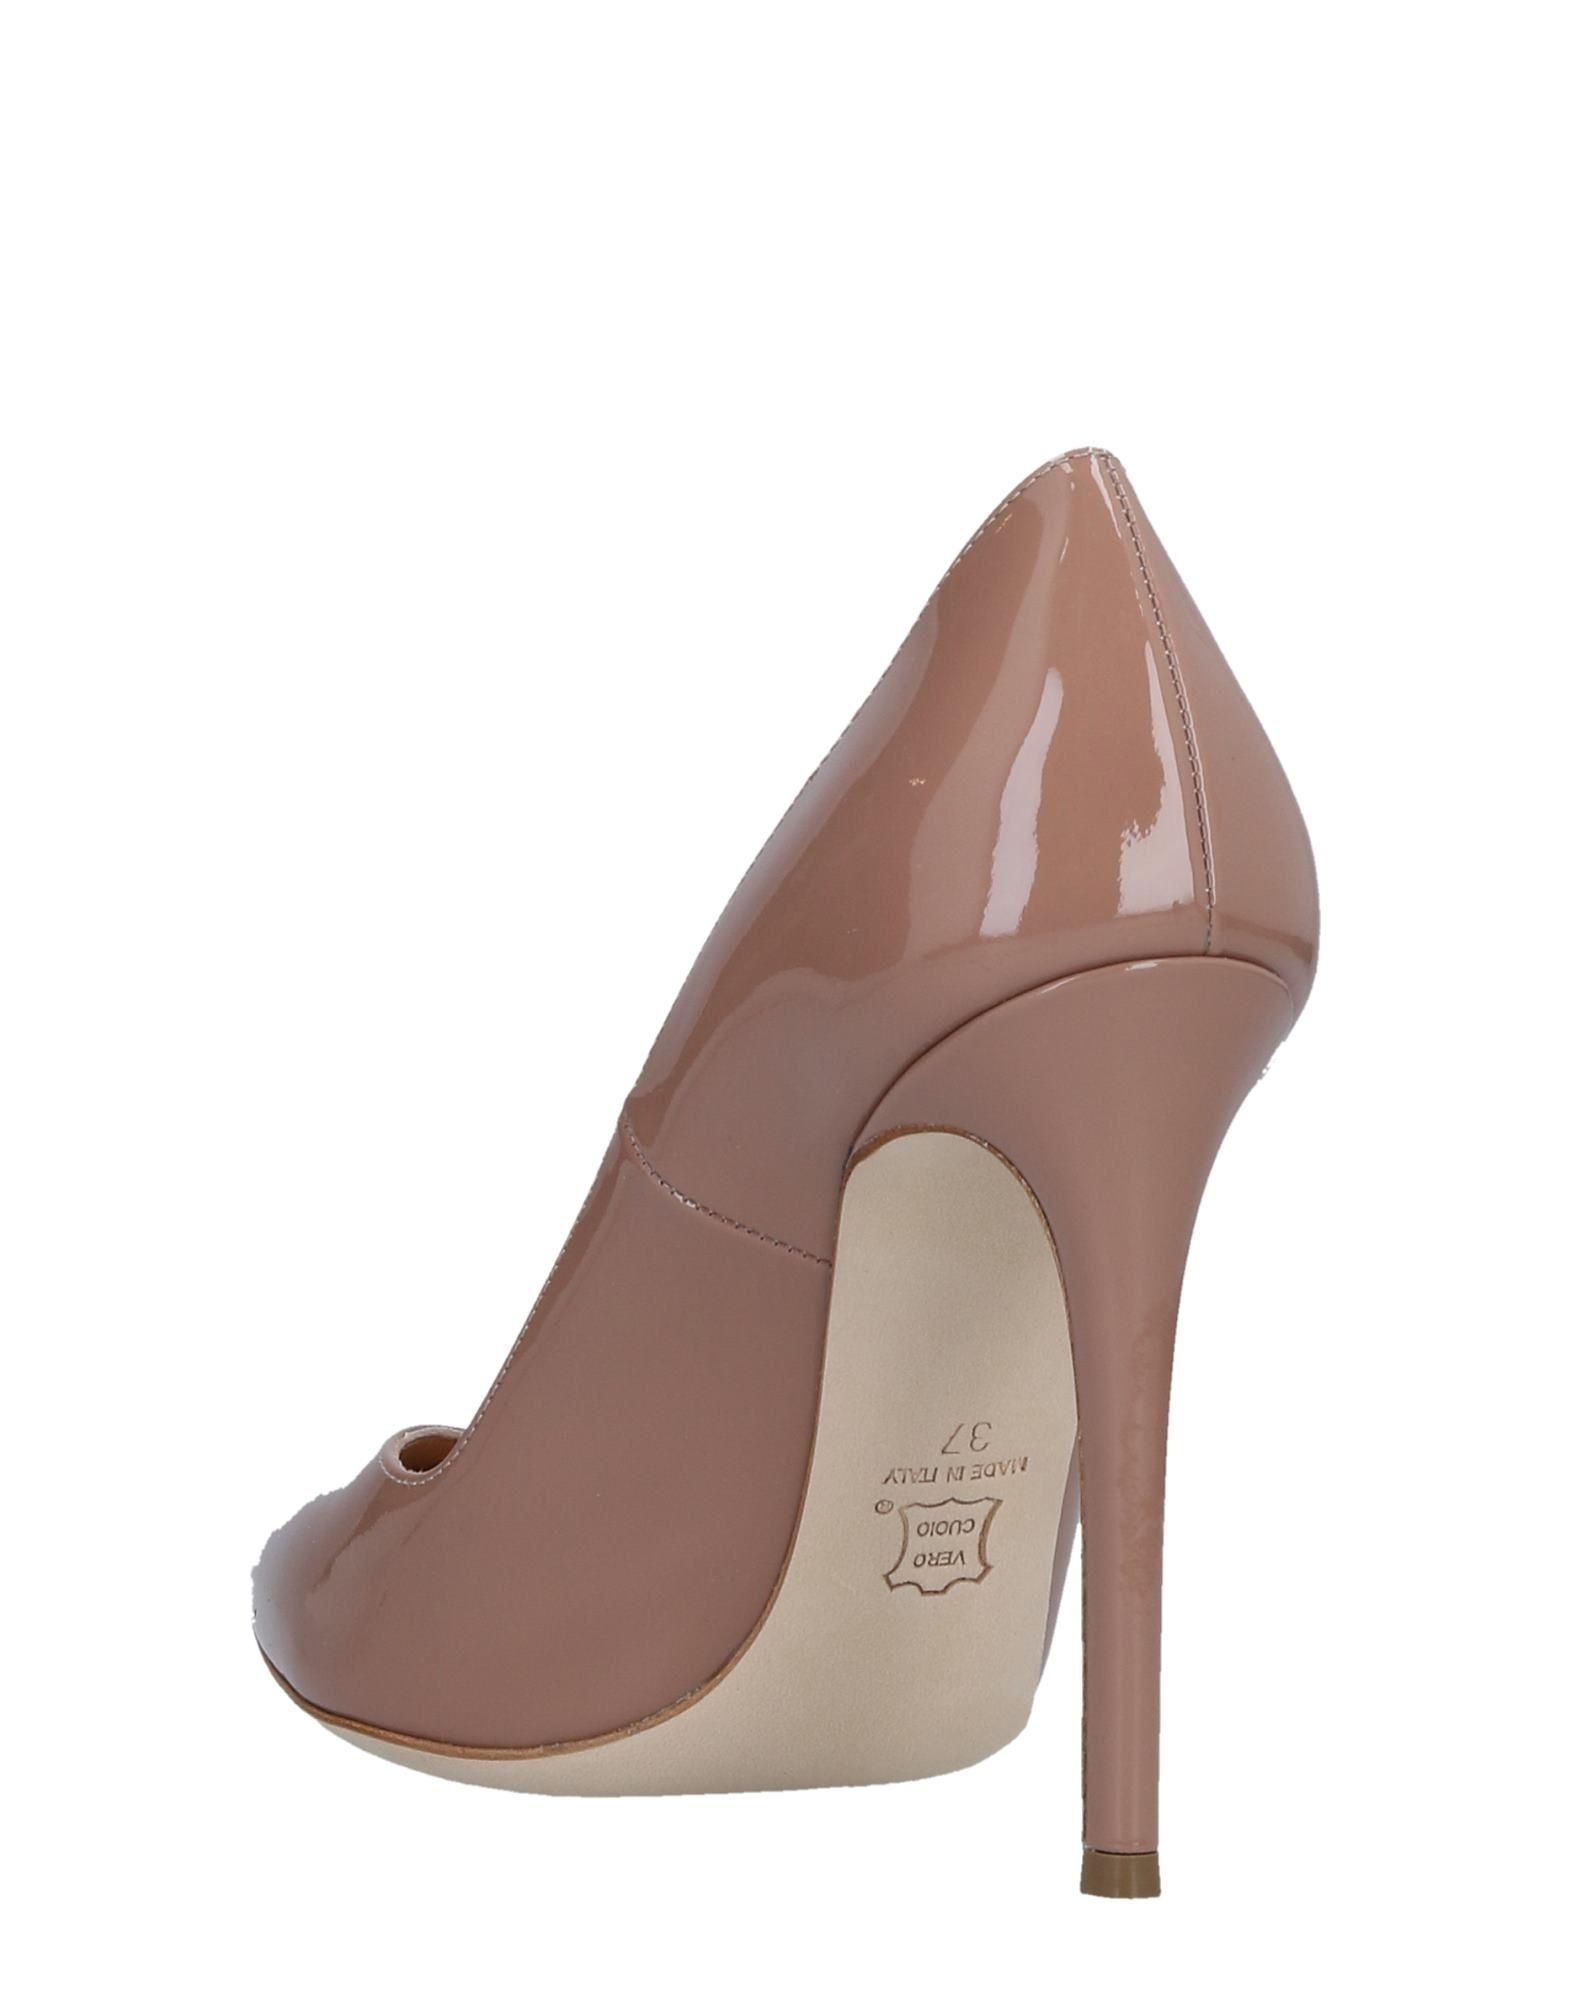 Lerre Pumps Damen   11508588JS Heiße Schuhe 138c56